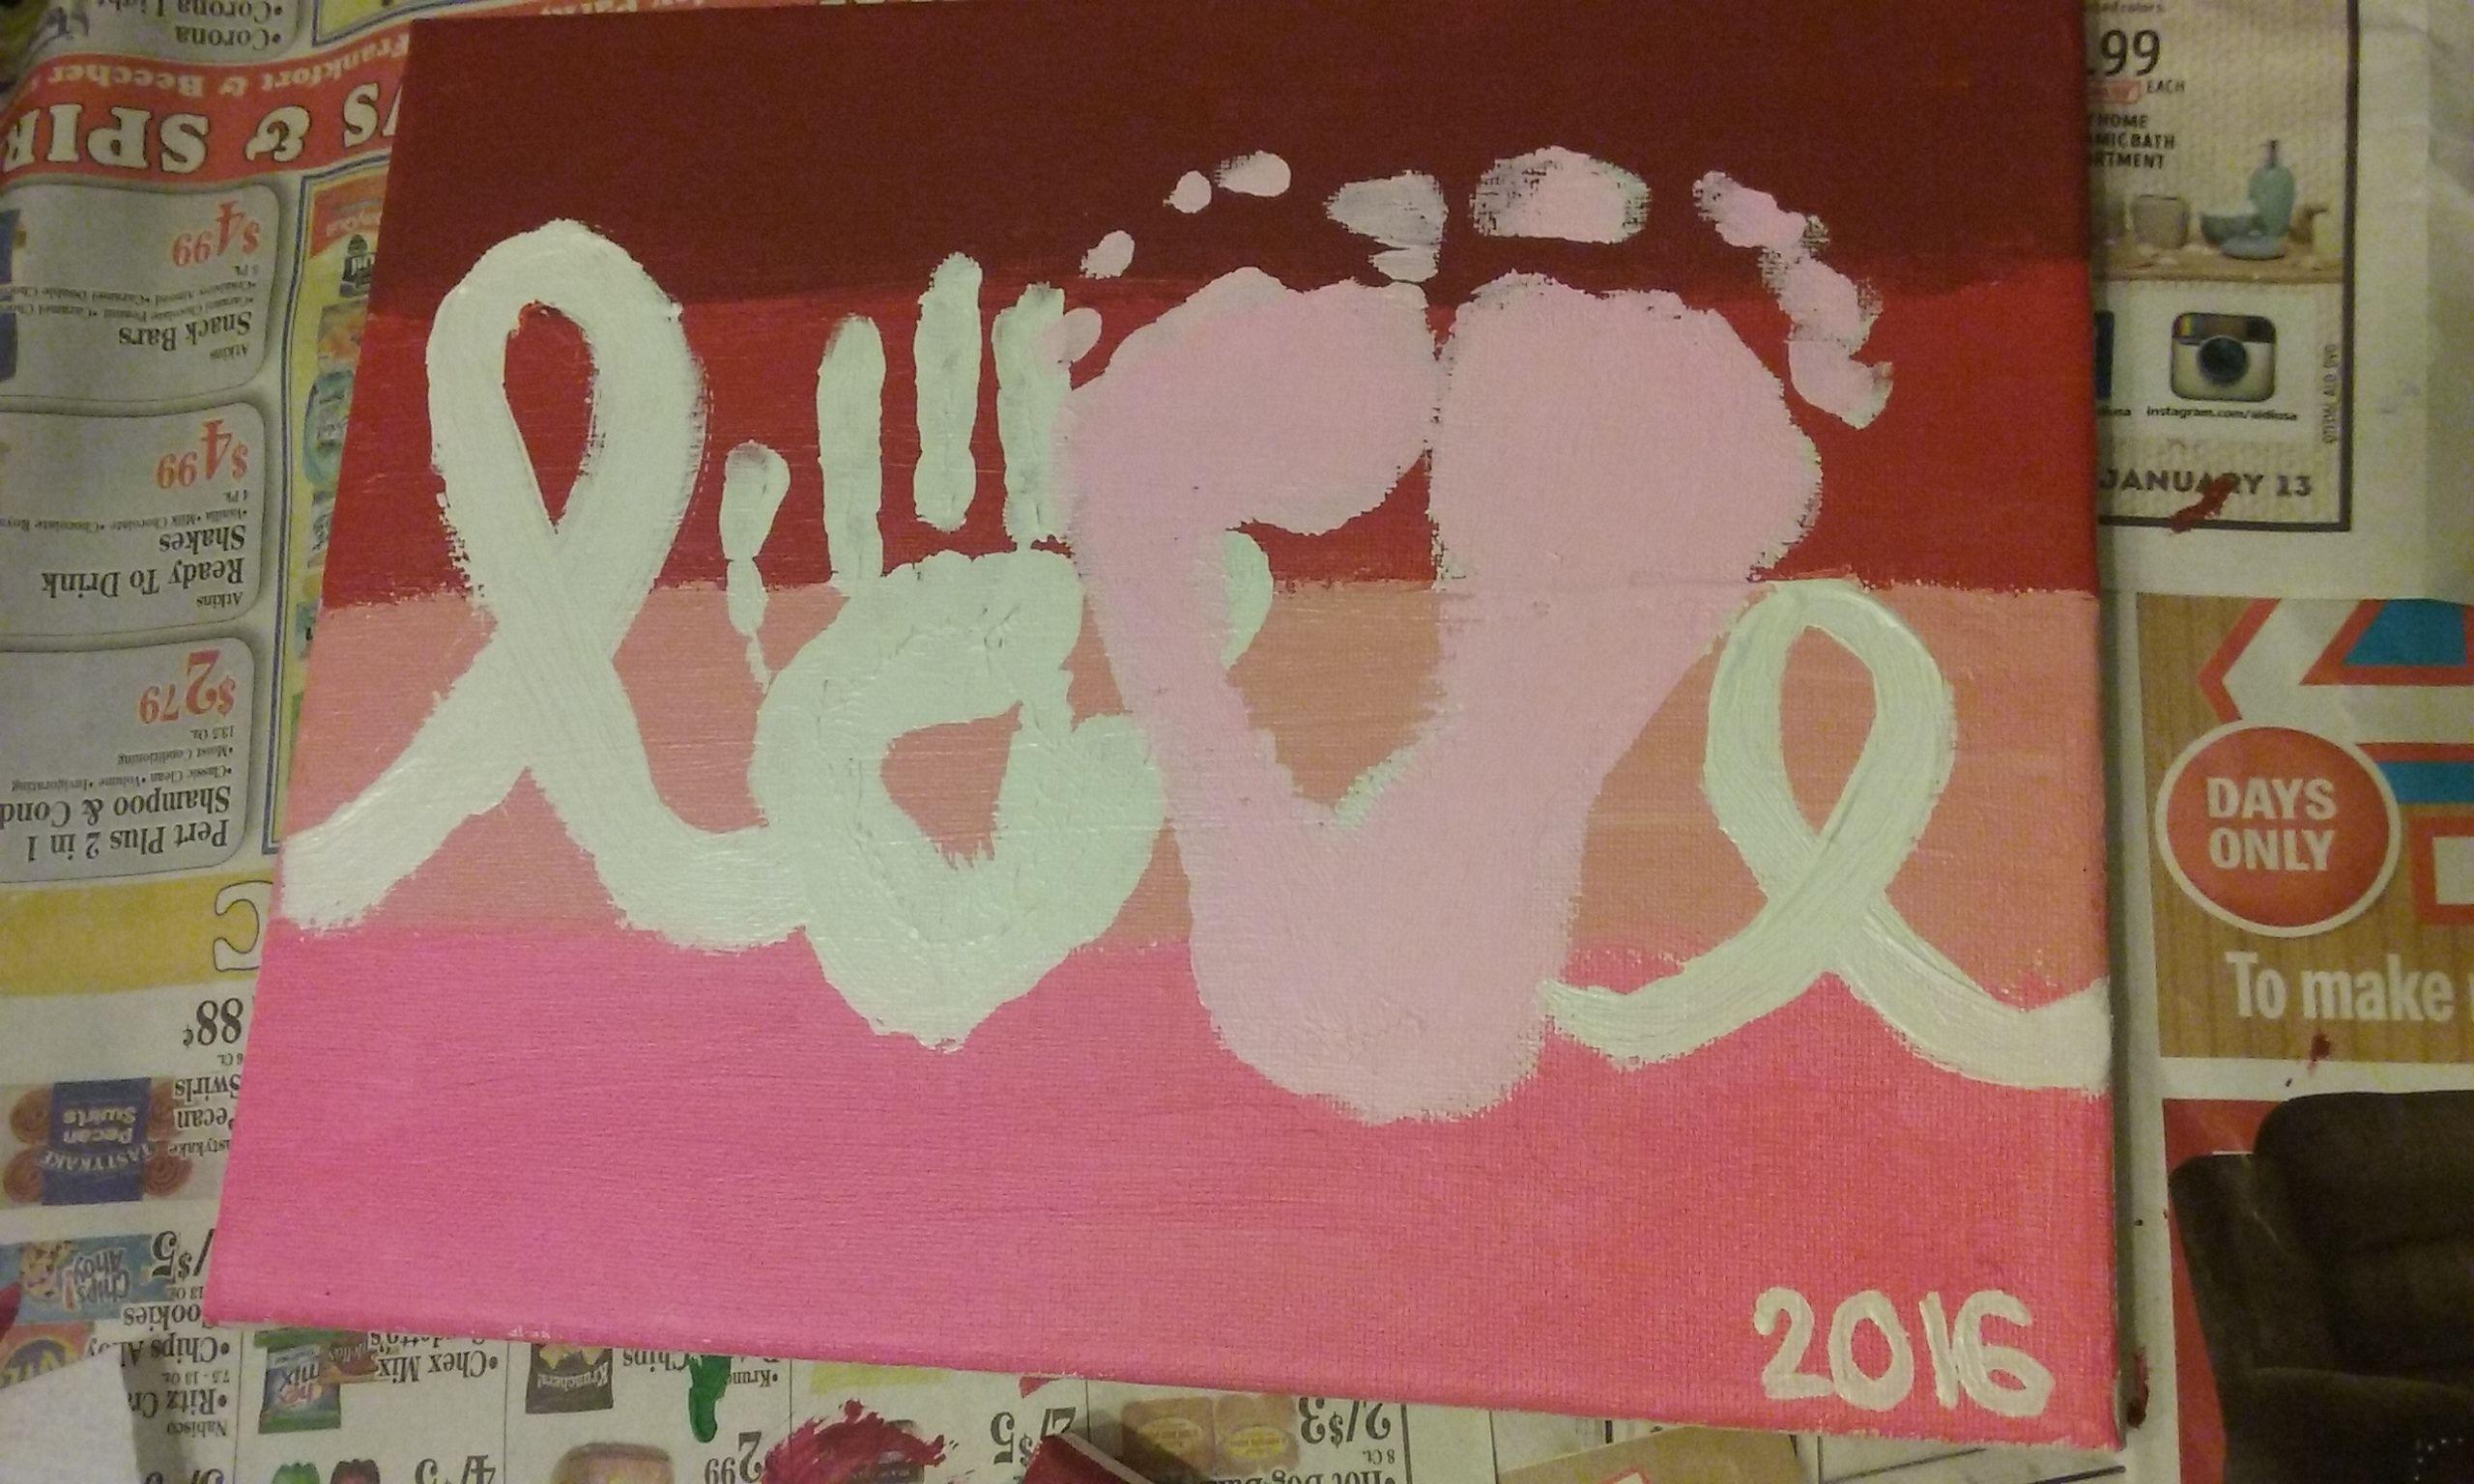 Gwen's hand and feet - Valentine's love craft on canvas